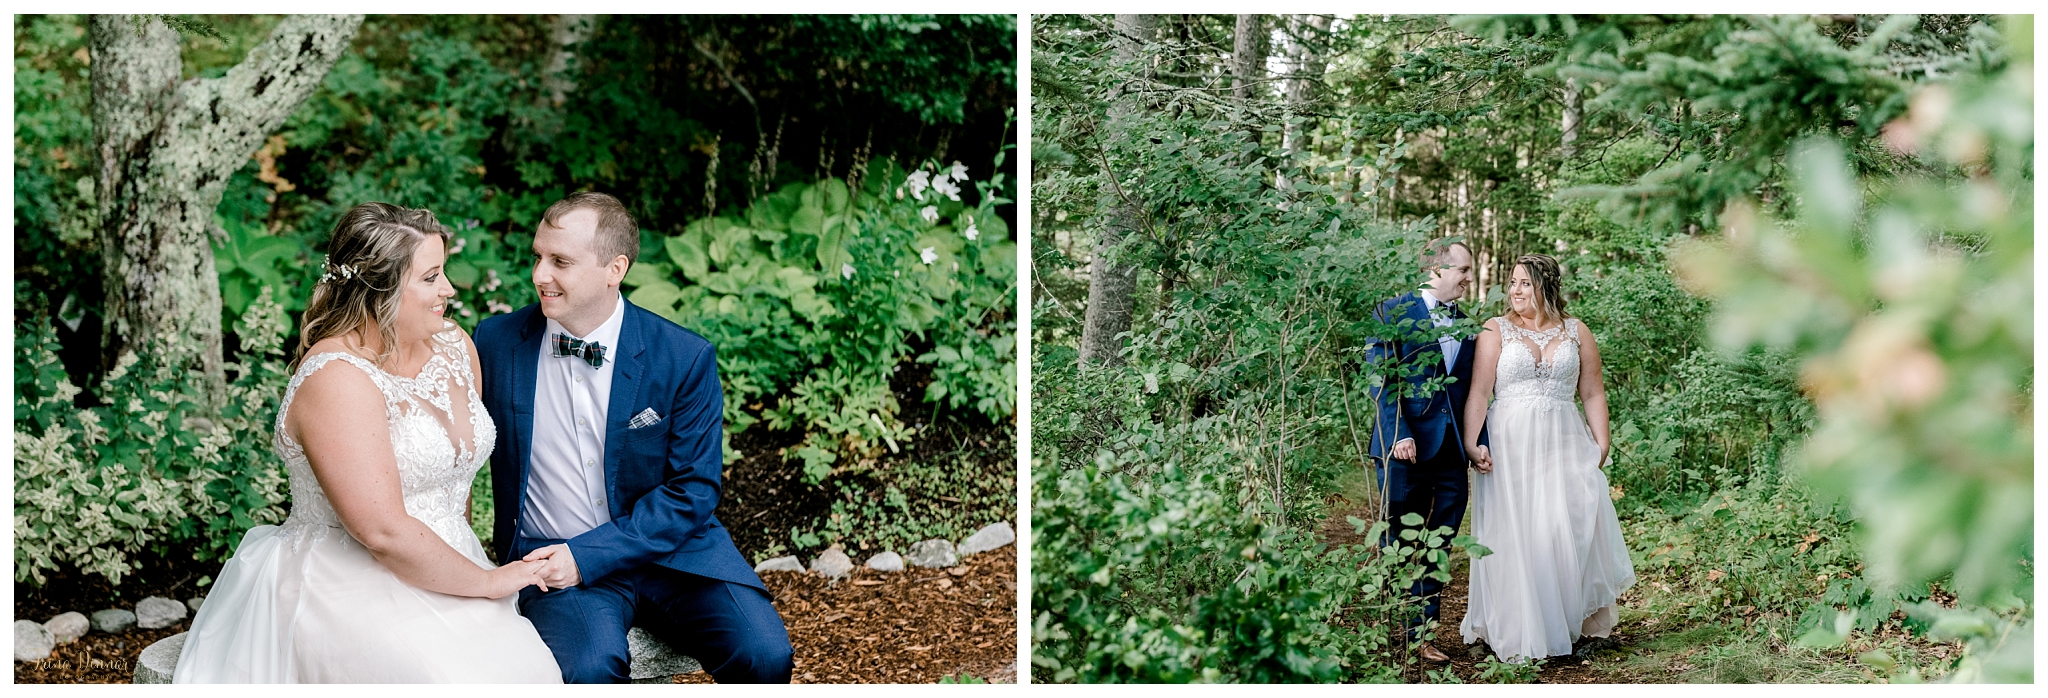 Jess and Dan's Capitol Island Wedding Portraits